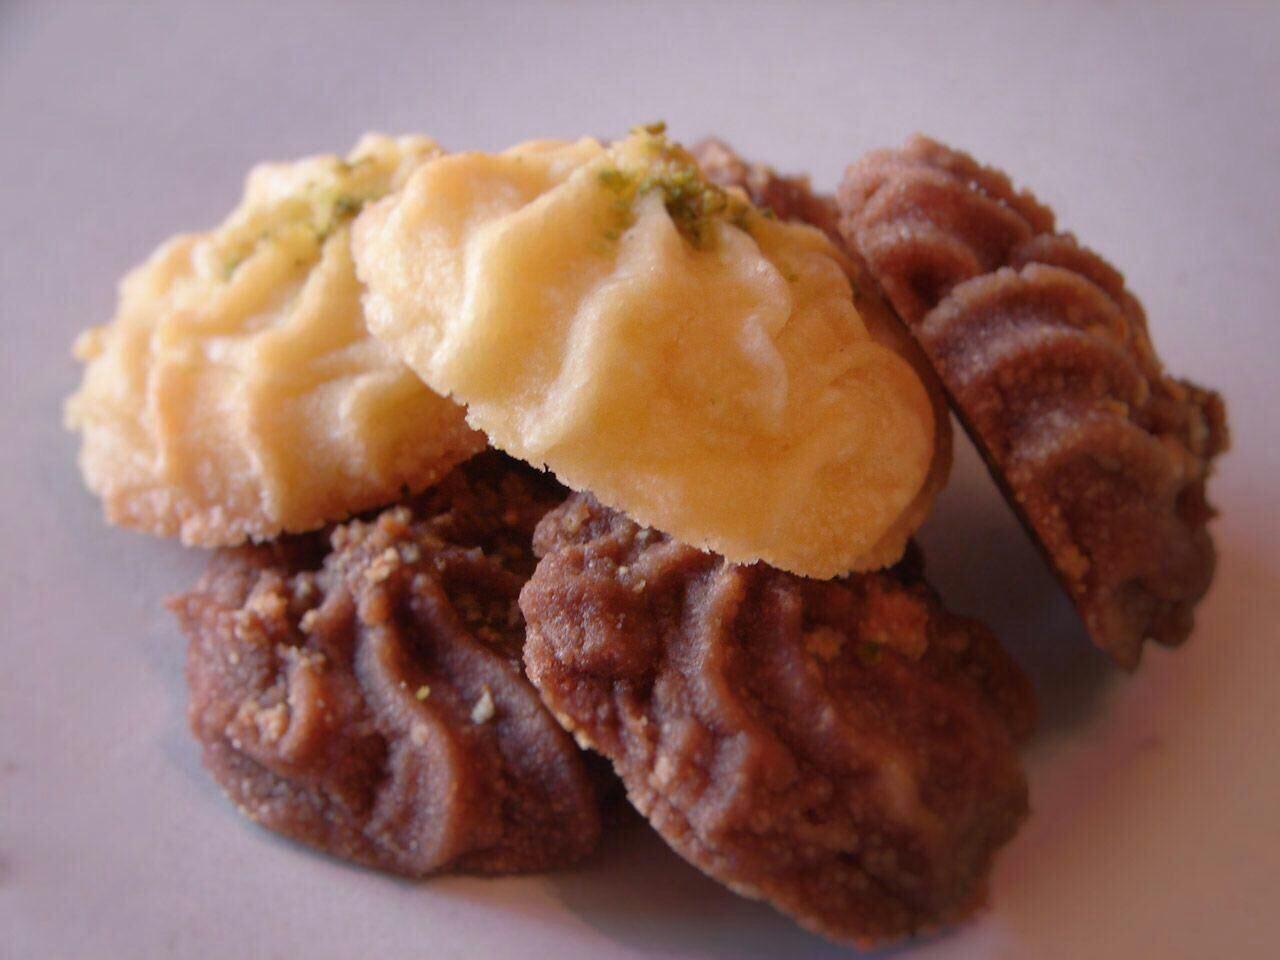 شیرینی کرکی , شیرینی عید نوروز